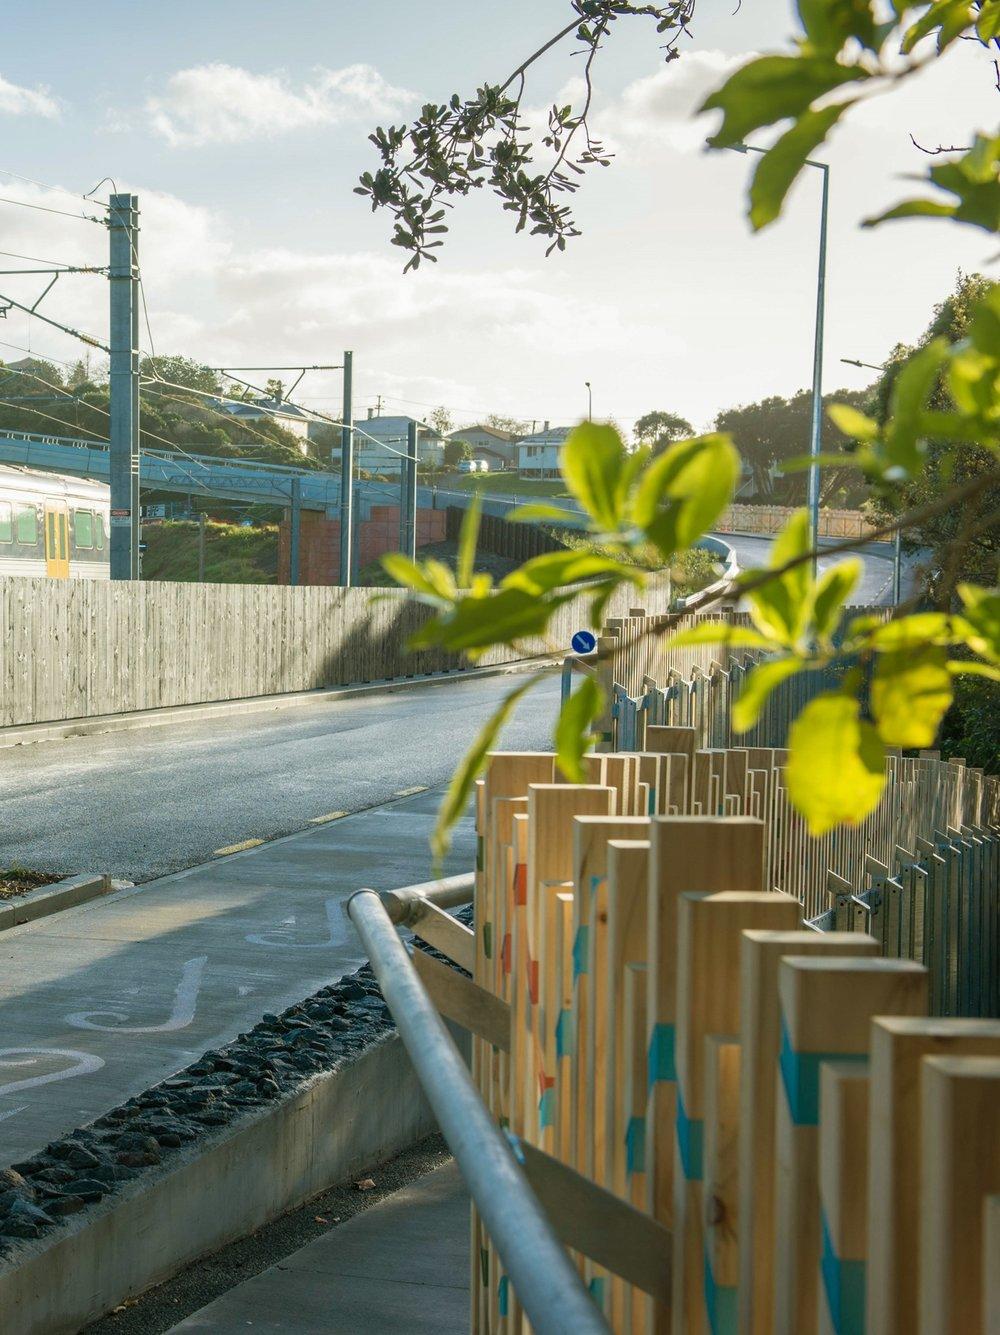 Vincent-Cowie-Street-overbridge-newmarket-Project-management-3-SM.jpg